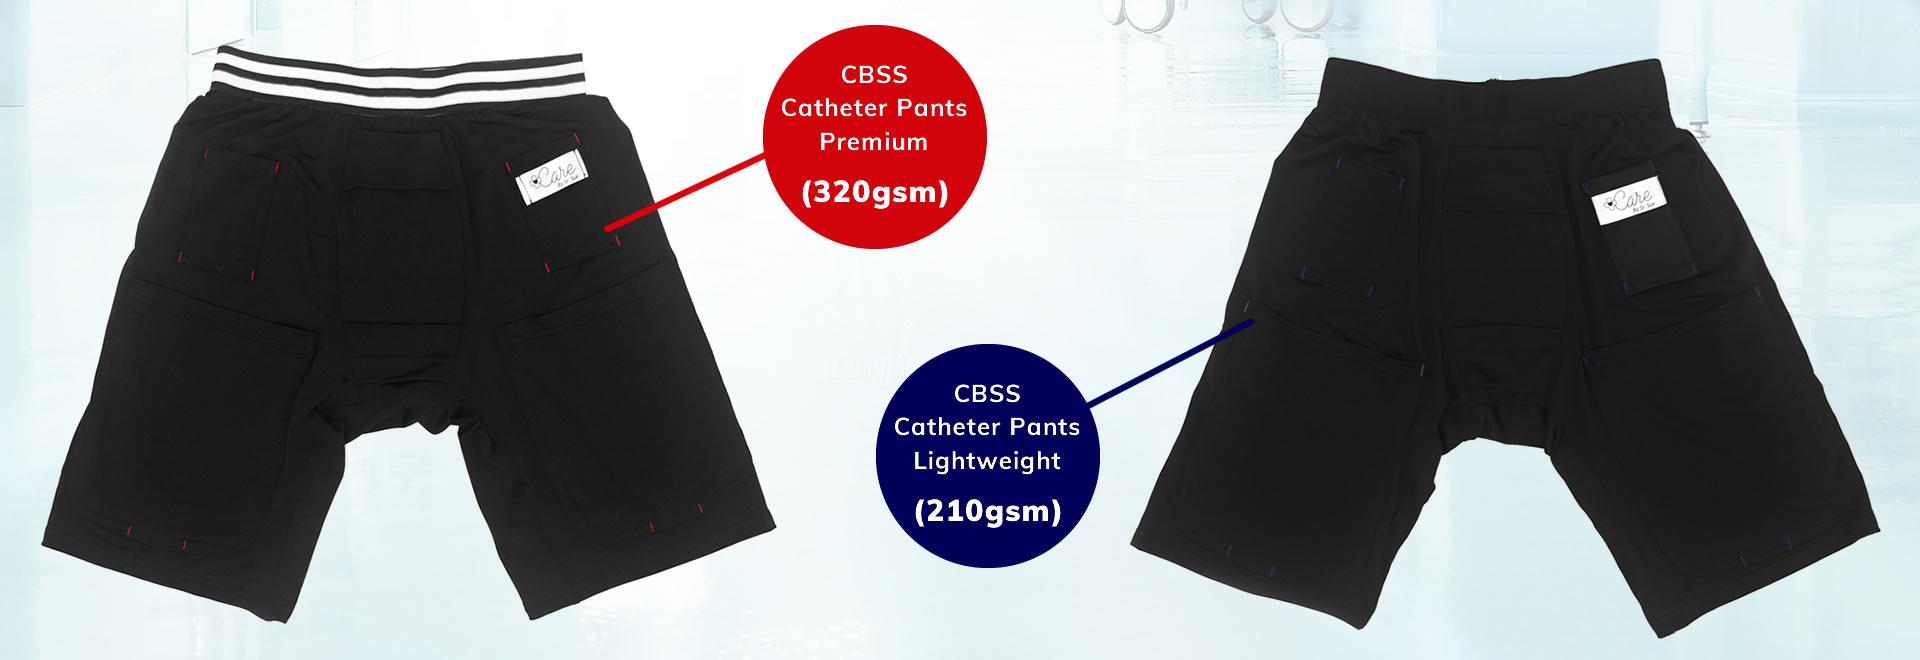 cbss catheter pants range